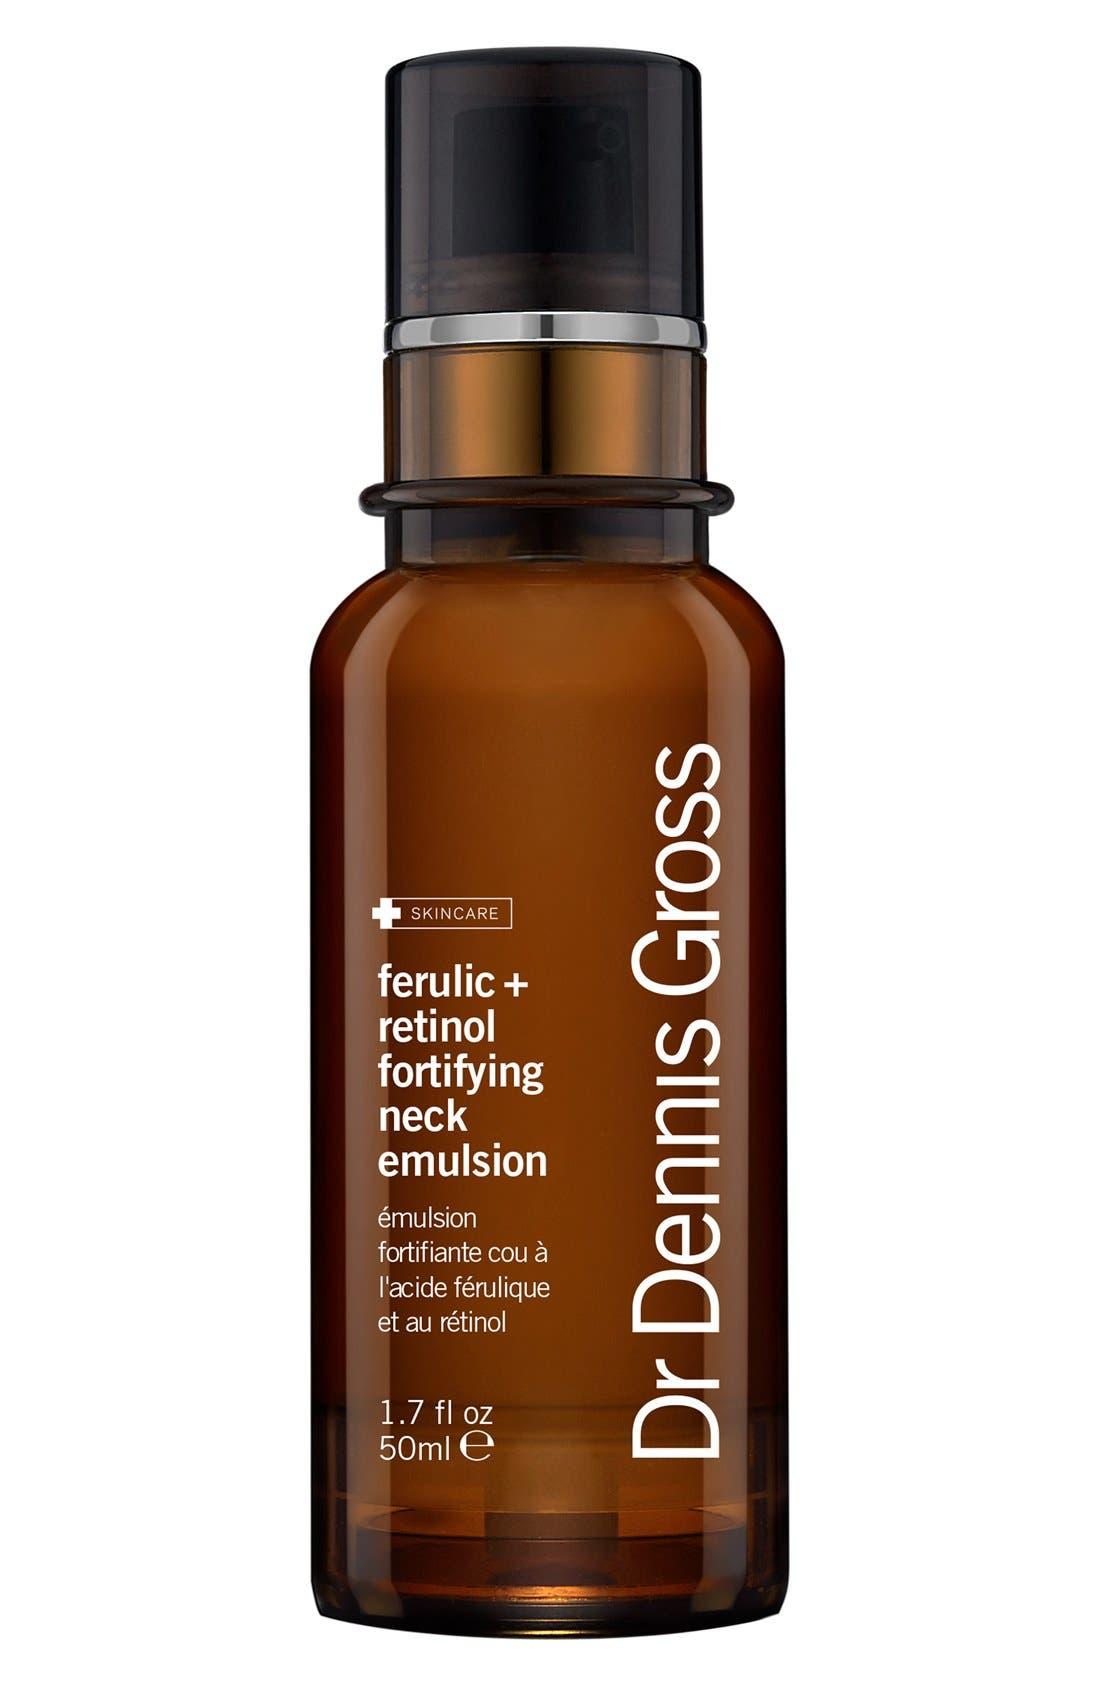 Dr. Dennis Gross Skincare 'Ferulic + Retinol' Fortifying Neck Emulsion